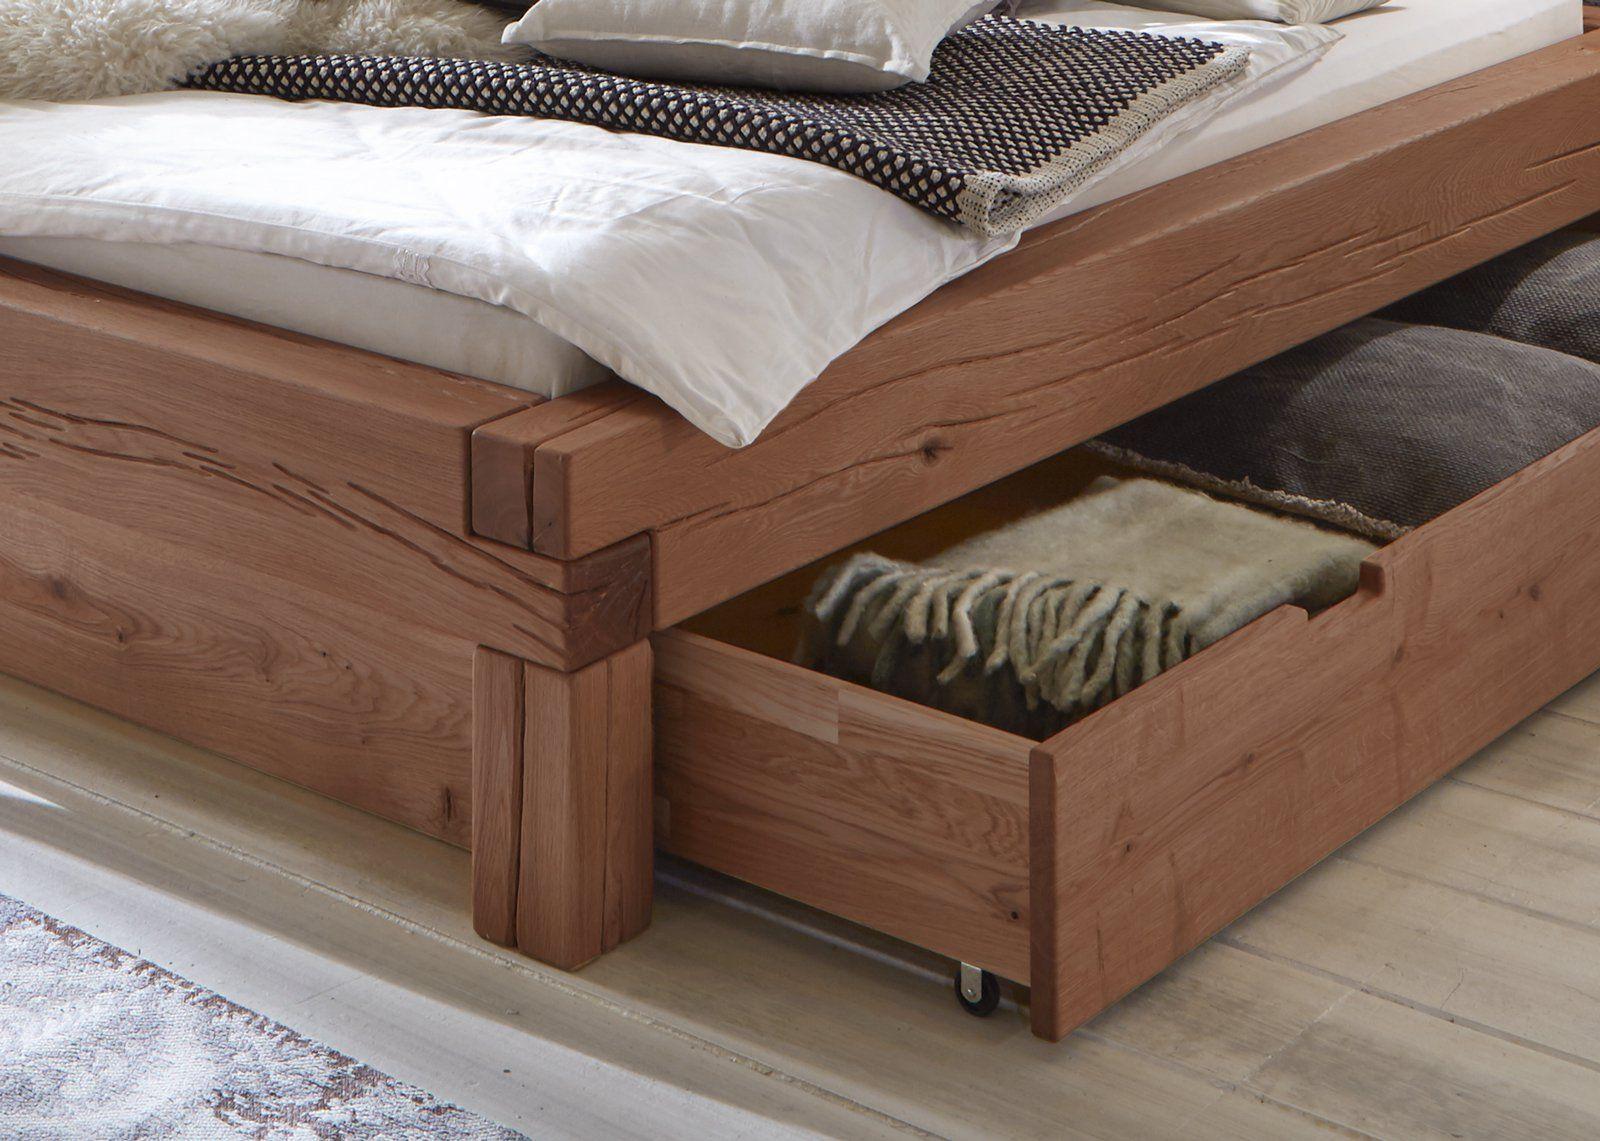 Sam Balkenbett 200x200 Massivholzbett Mit Bettkasten Fichte Elias Palettenschlafzimmermobel Bett Massivholzbett